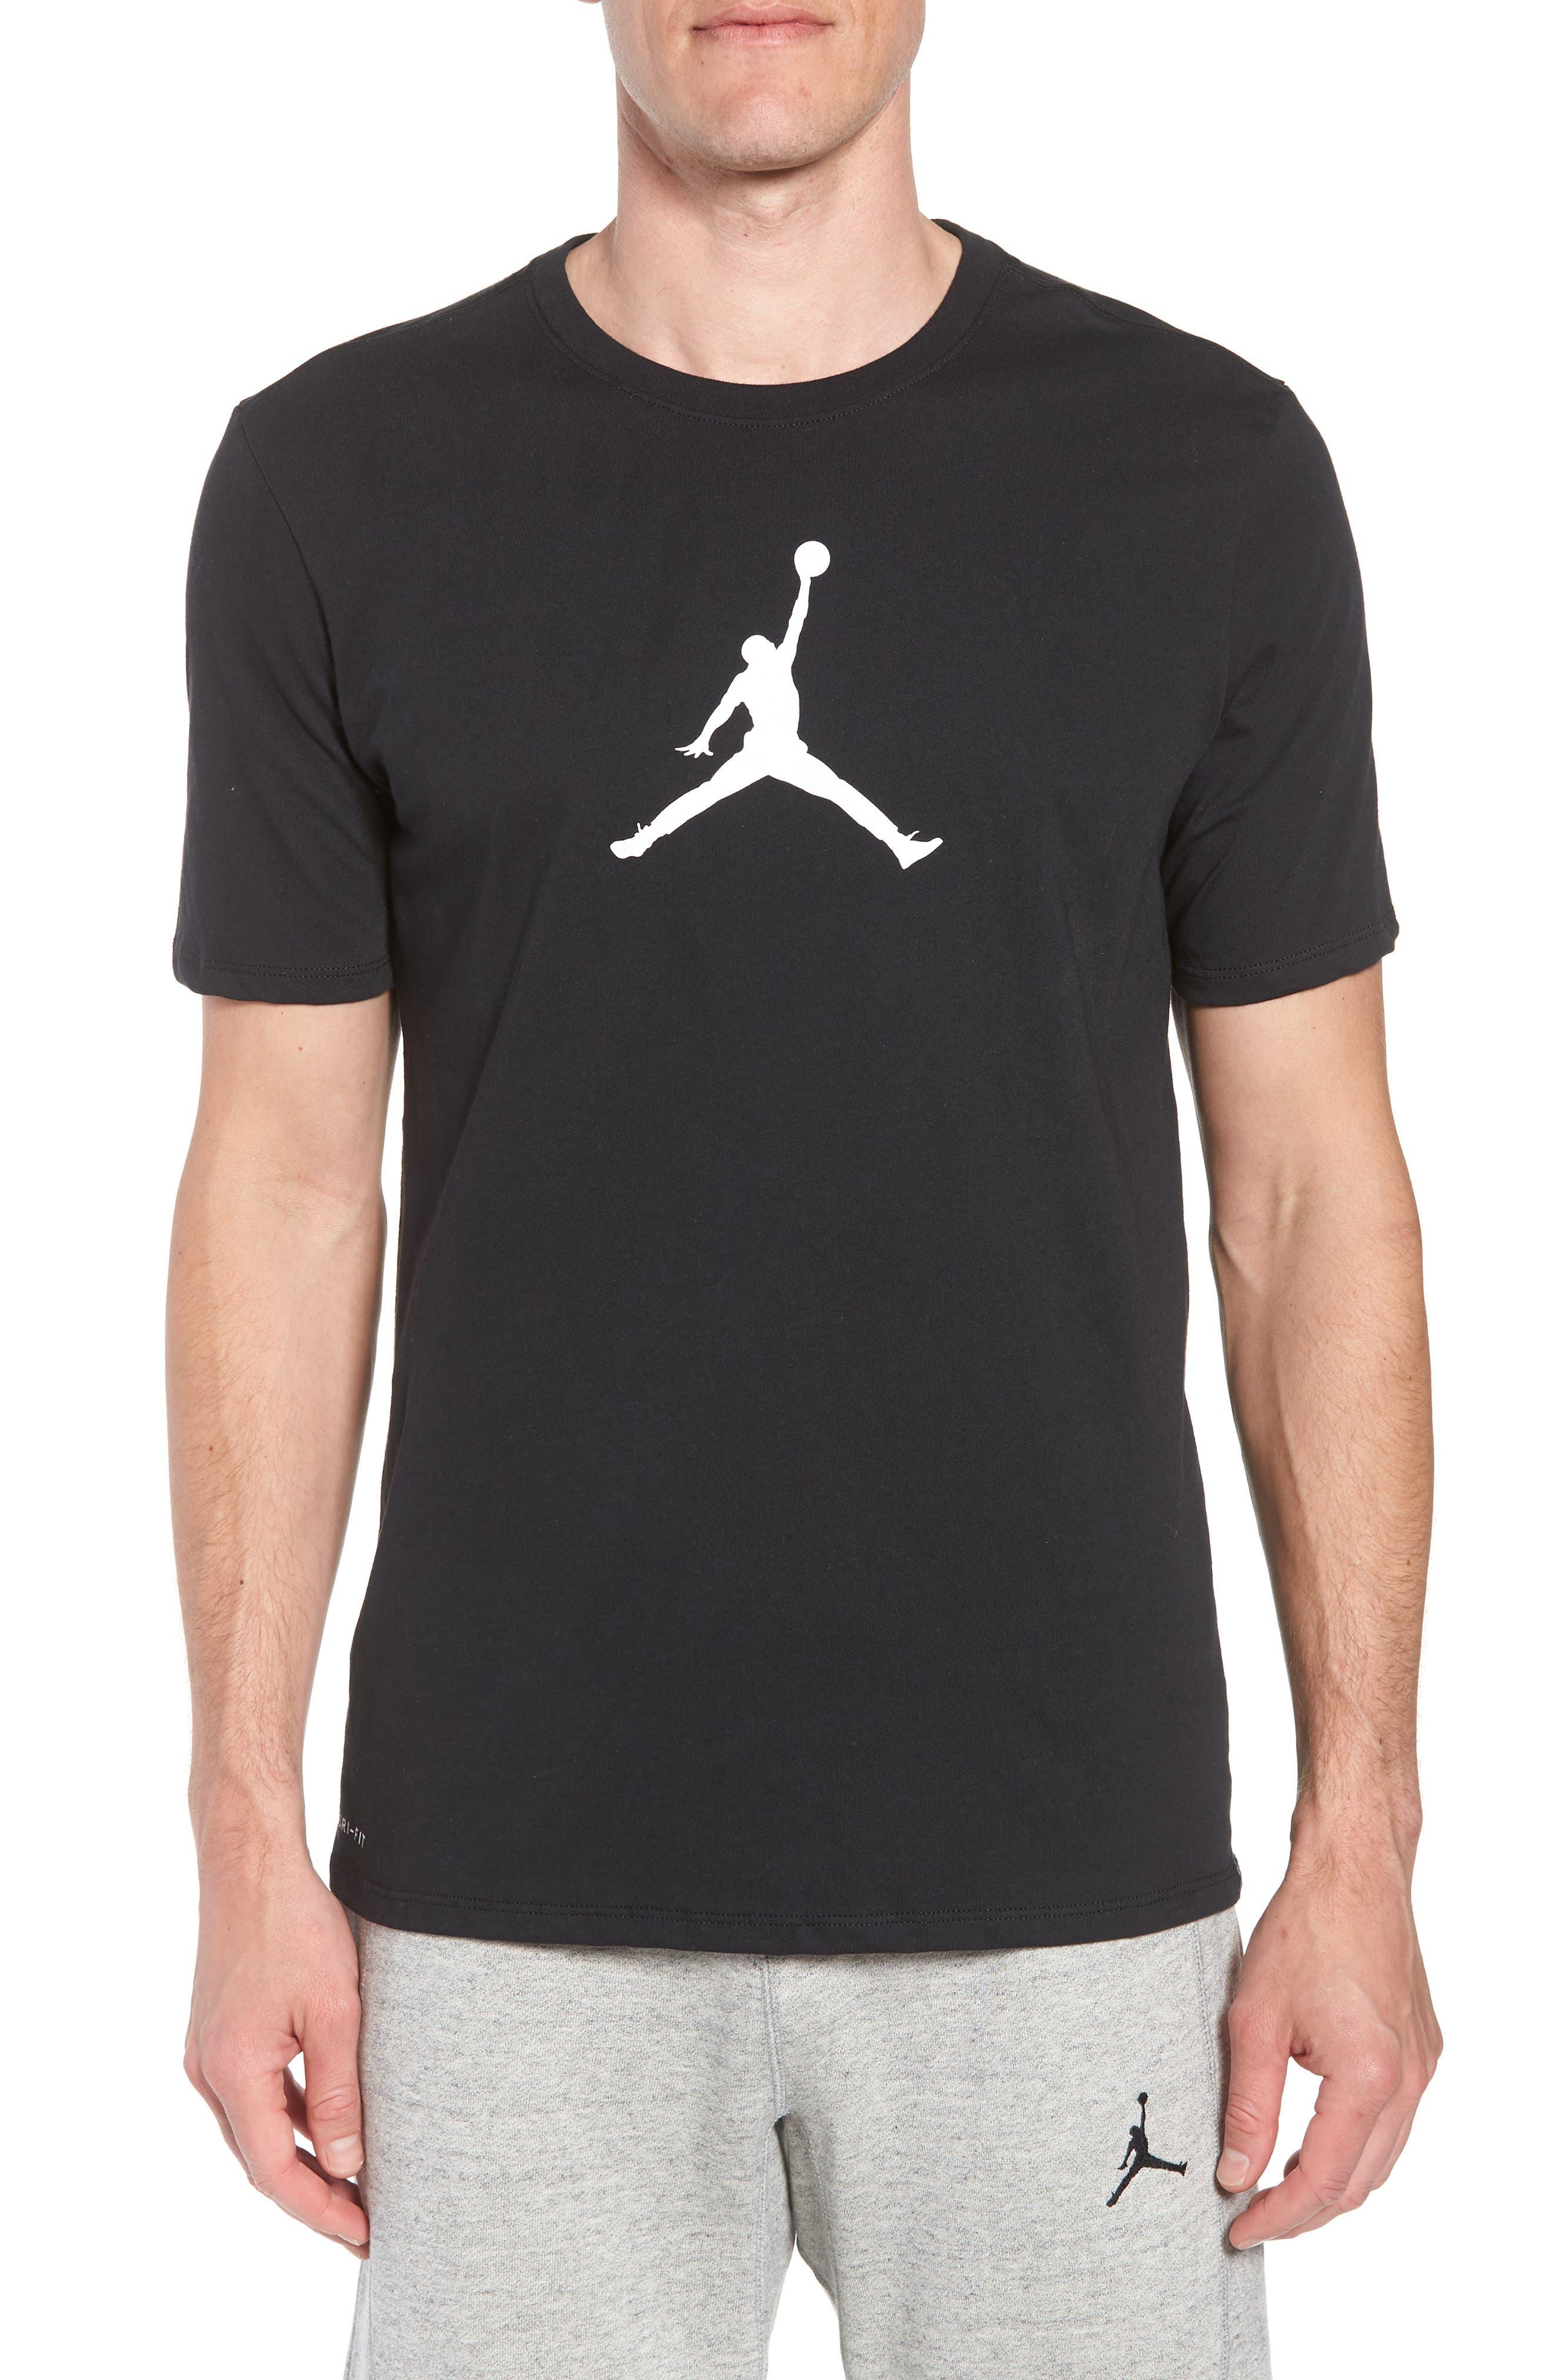 Iconic Jumpman Graphic T-Shirt,                         Main,                         color, Black/ White